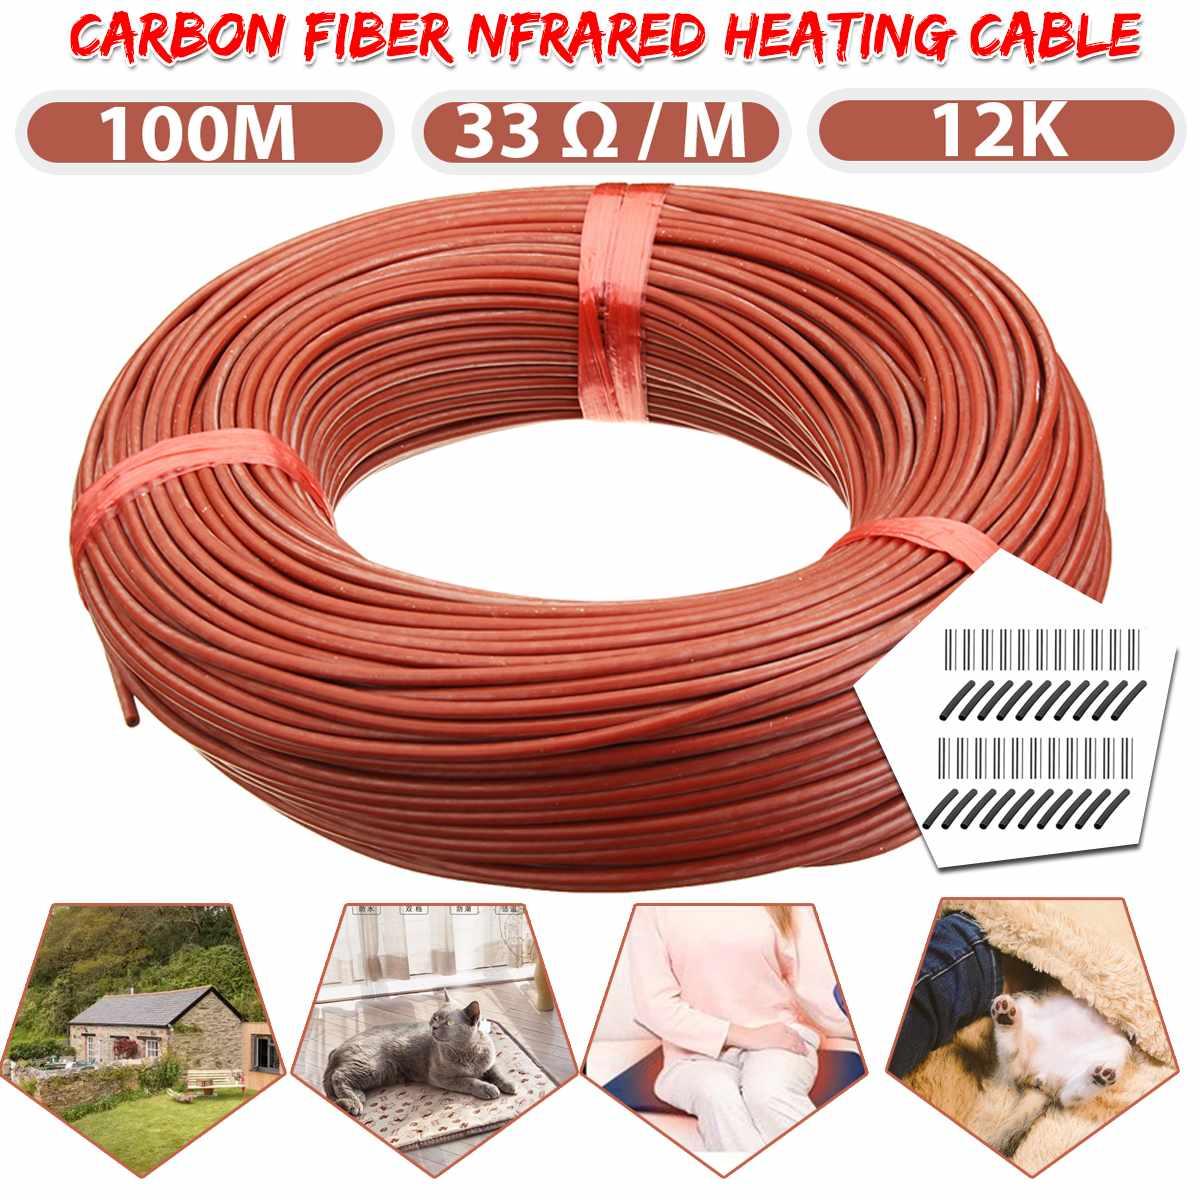 12K 33ohm/m Carbon Fiber Heating Cable 100m Warm Floor Heating Wire Low Cost Carbon Warm Floor Heating Equipment